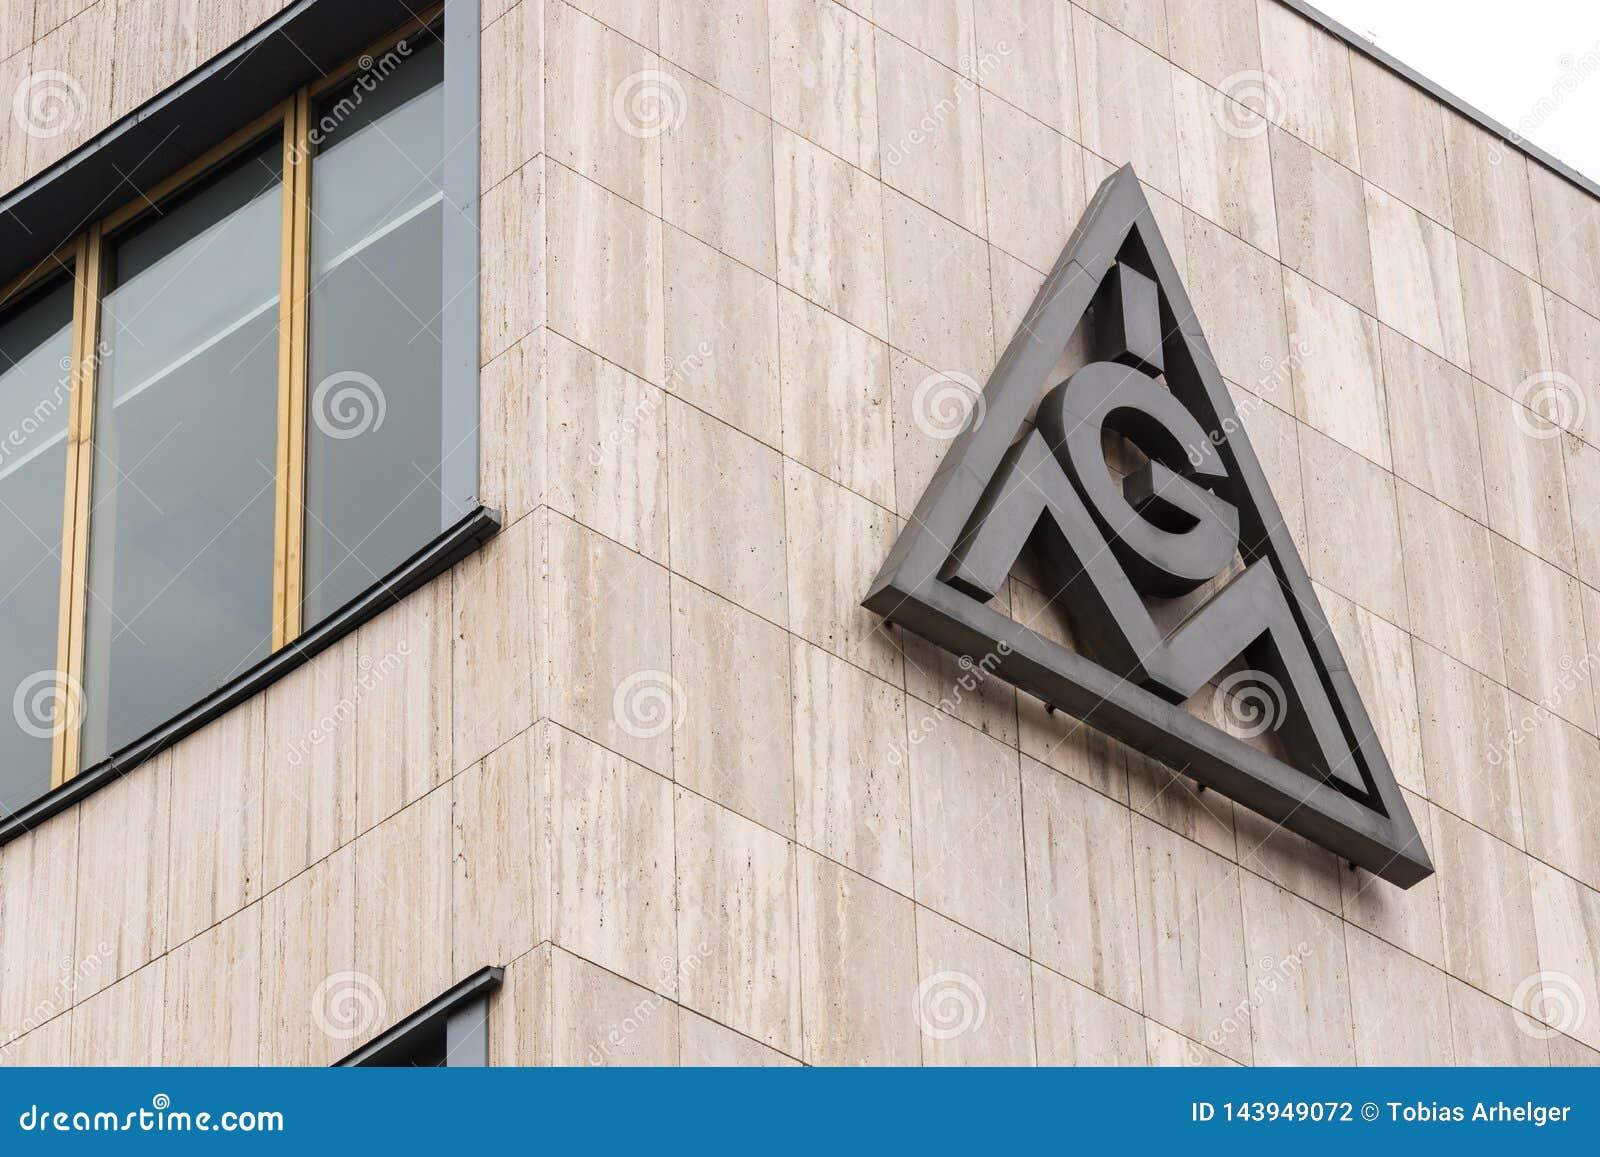 Берлин, Бранденбург/Германия - 15 03 19: здание IG Metall в Берлине Германии